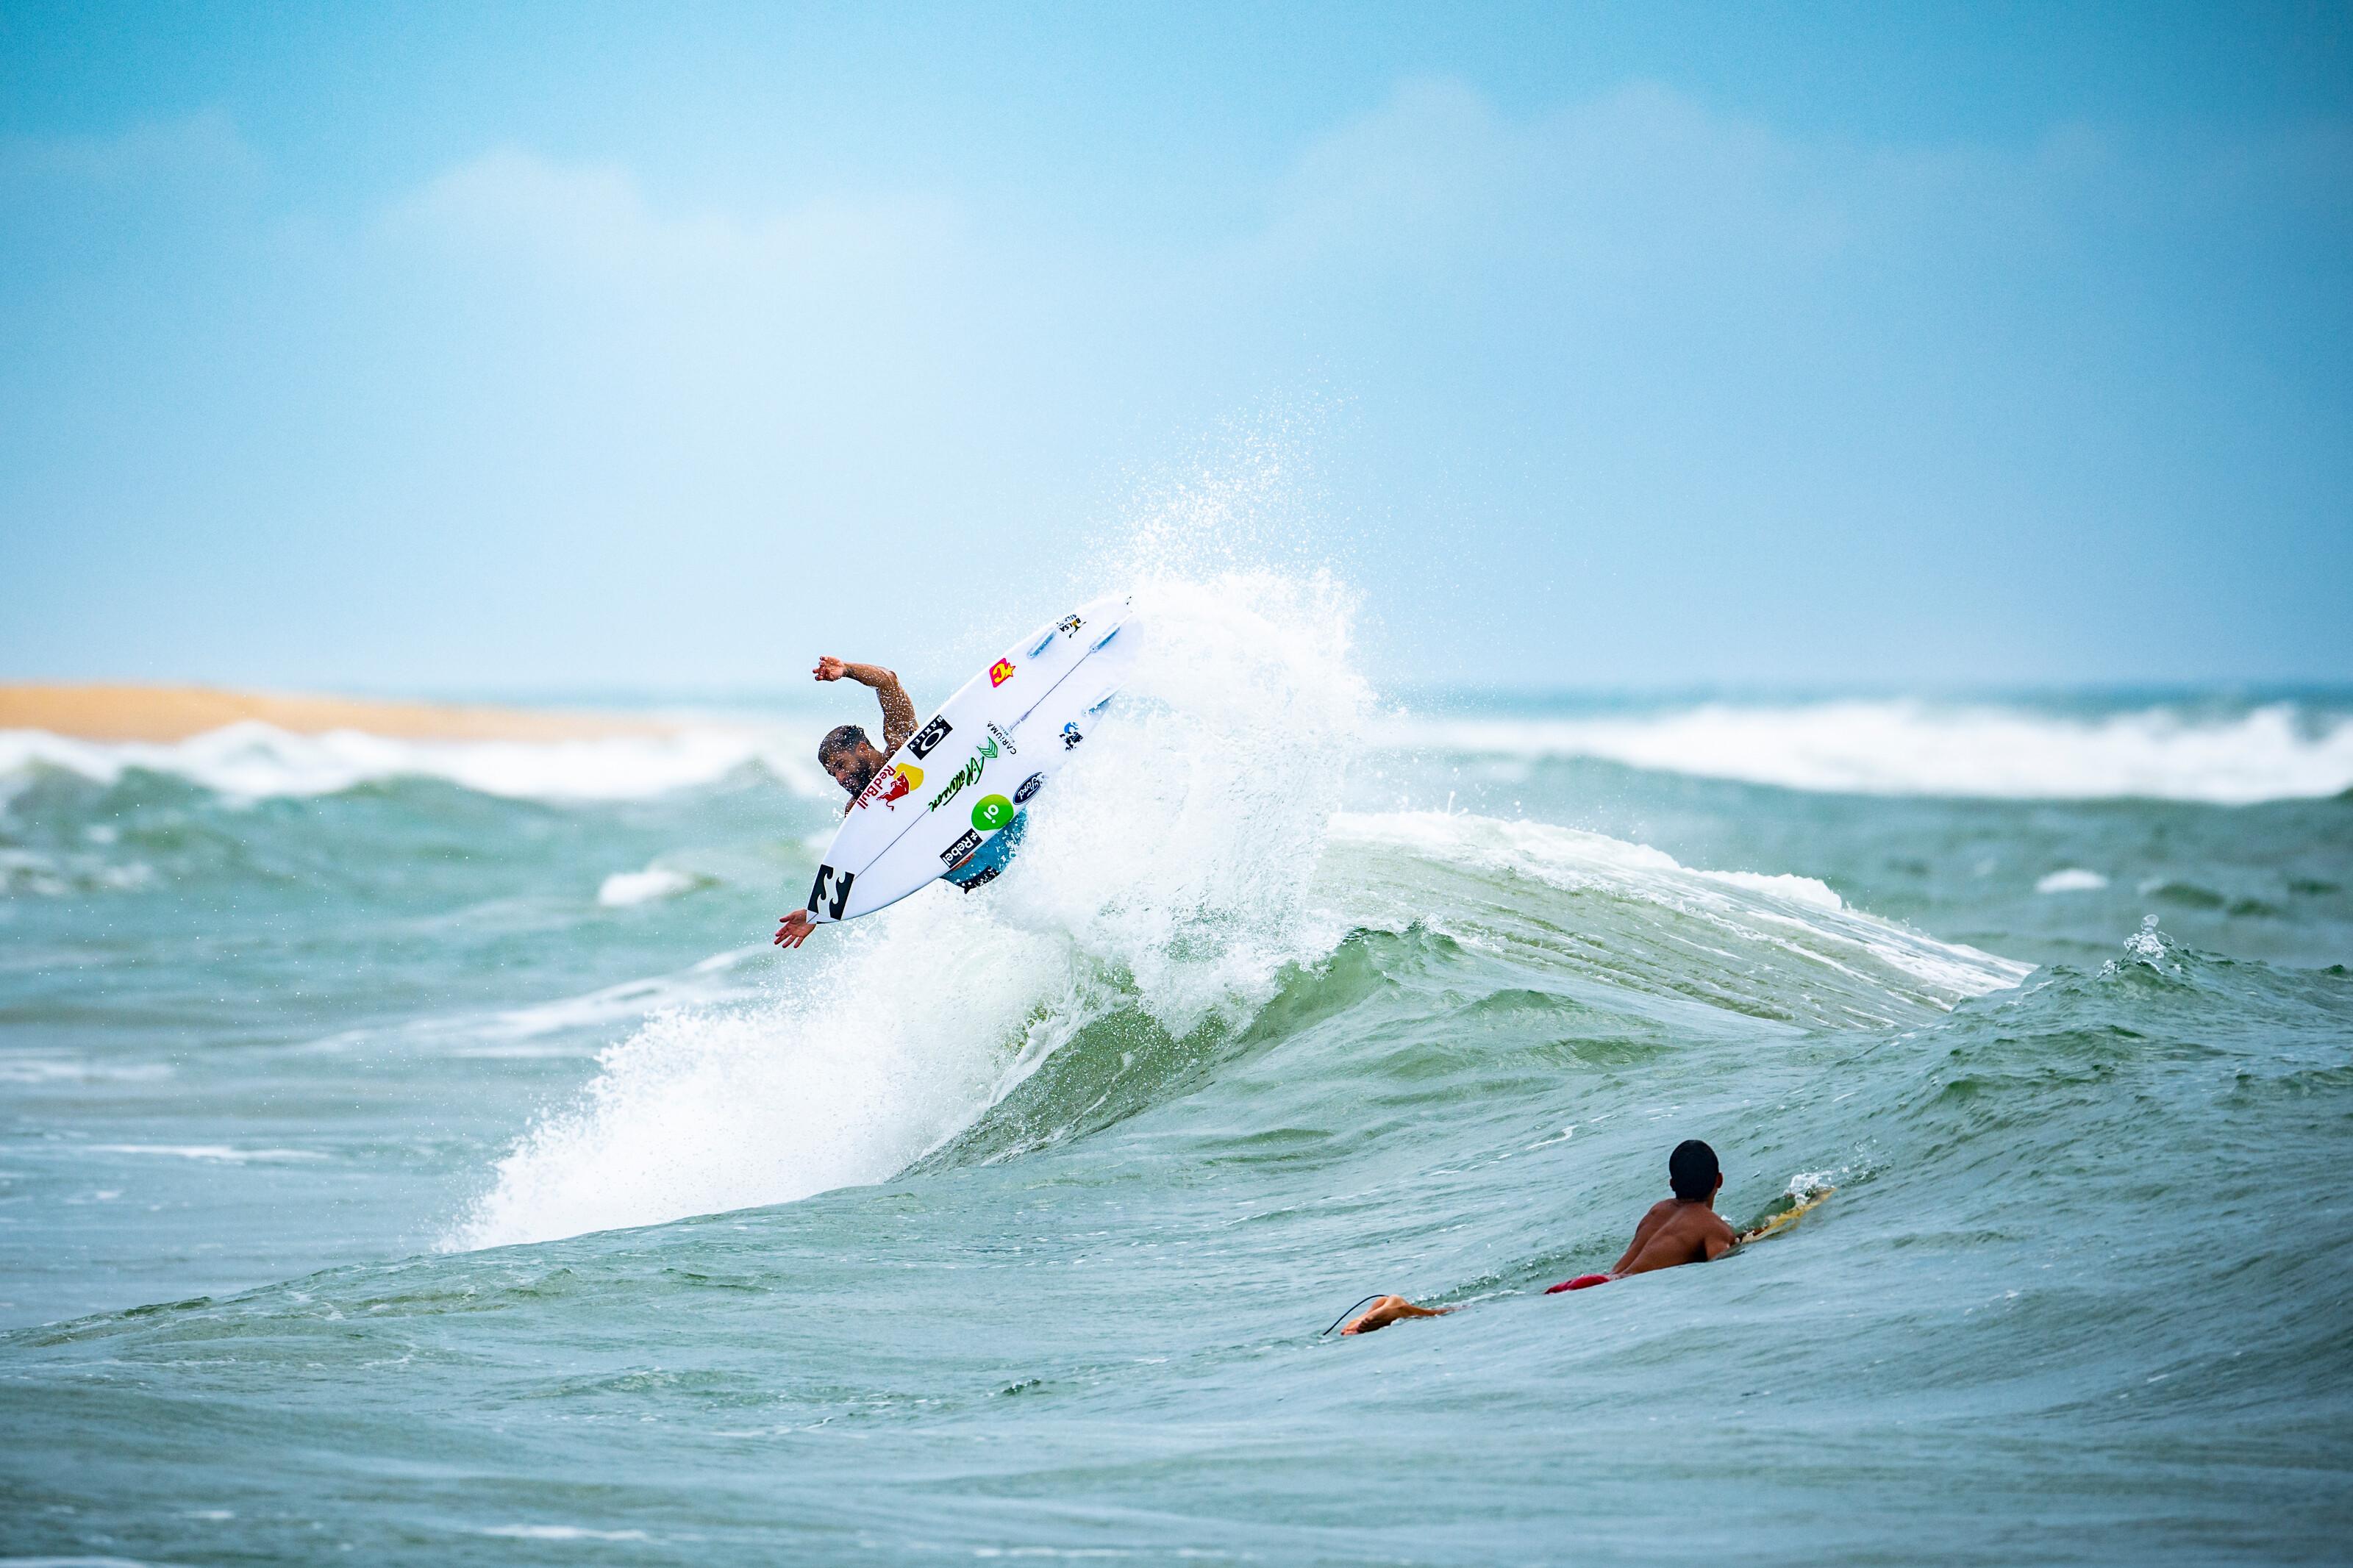 Italo Ferreira surfing